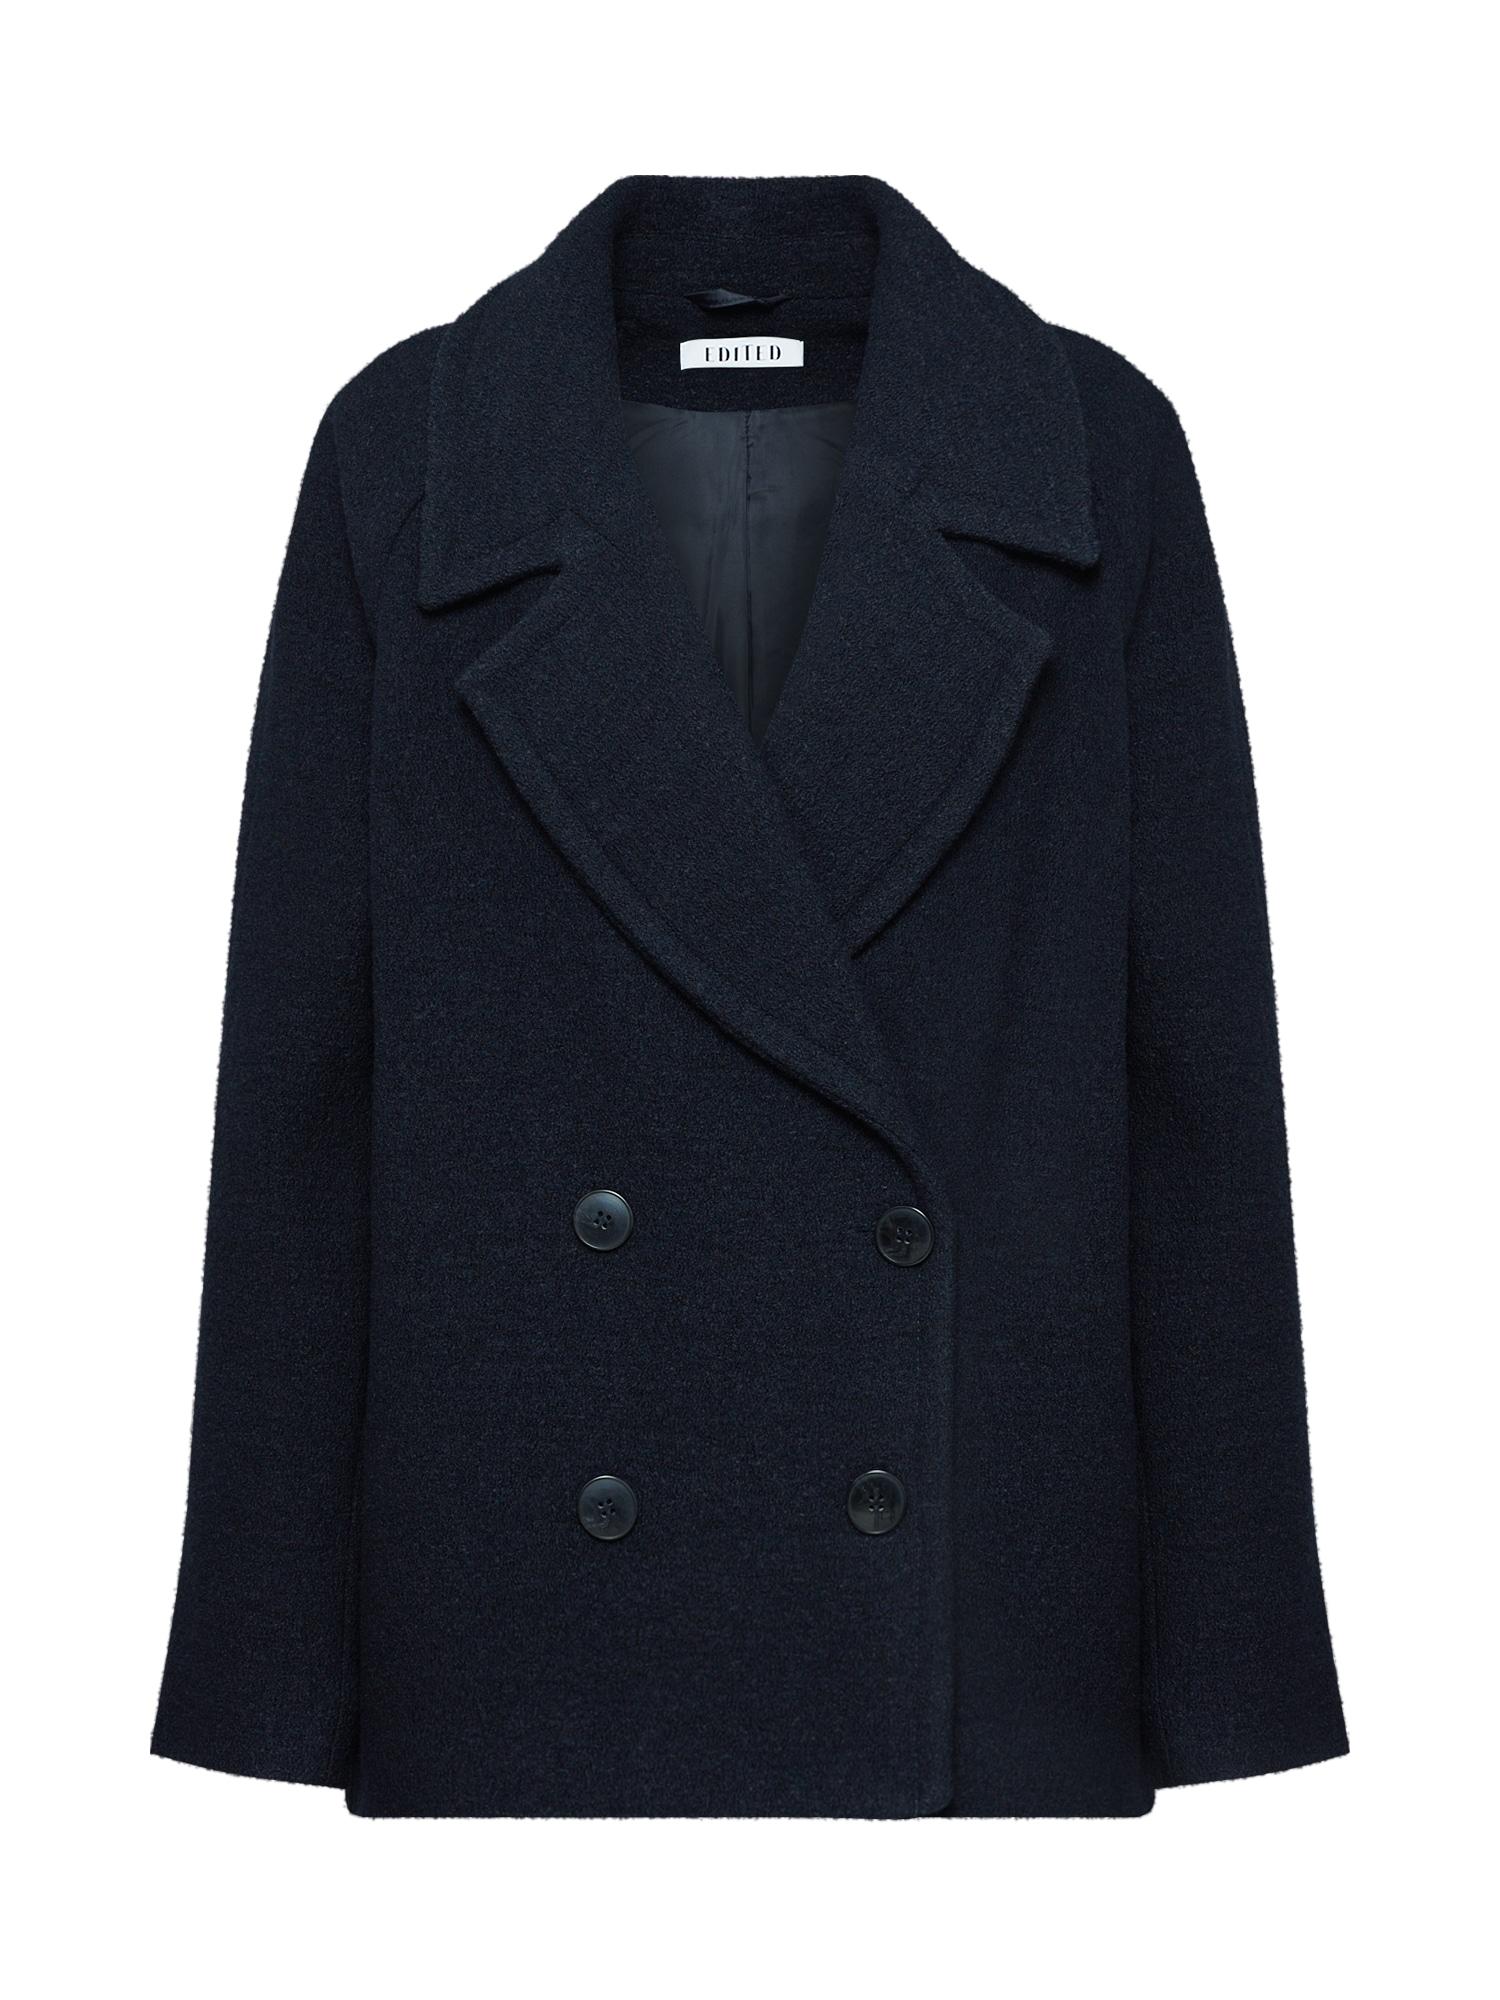 EDITED Rudeninis-žieminis paltas 'Leytun' mėlyna / tamsiai mėlyna